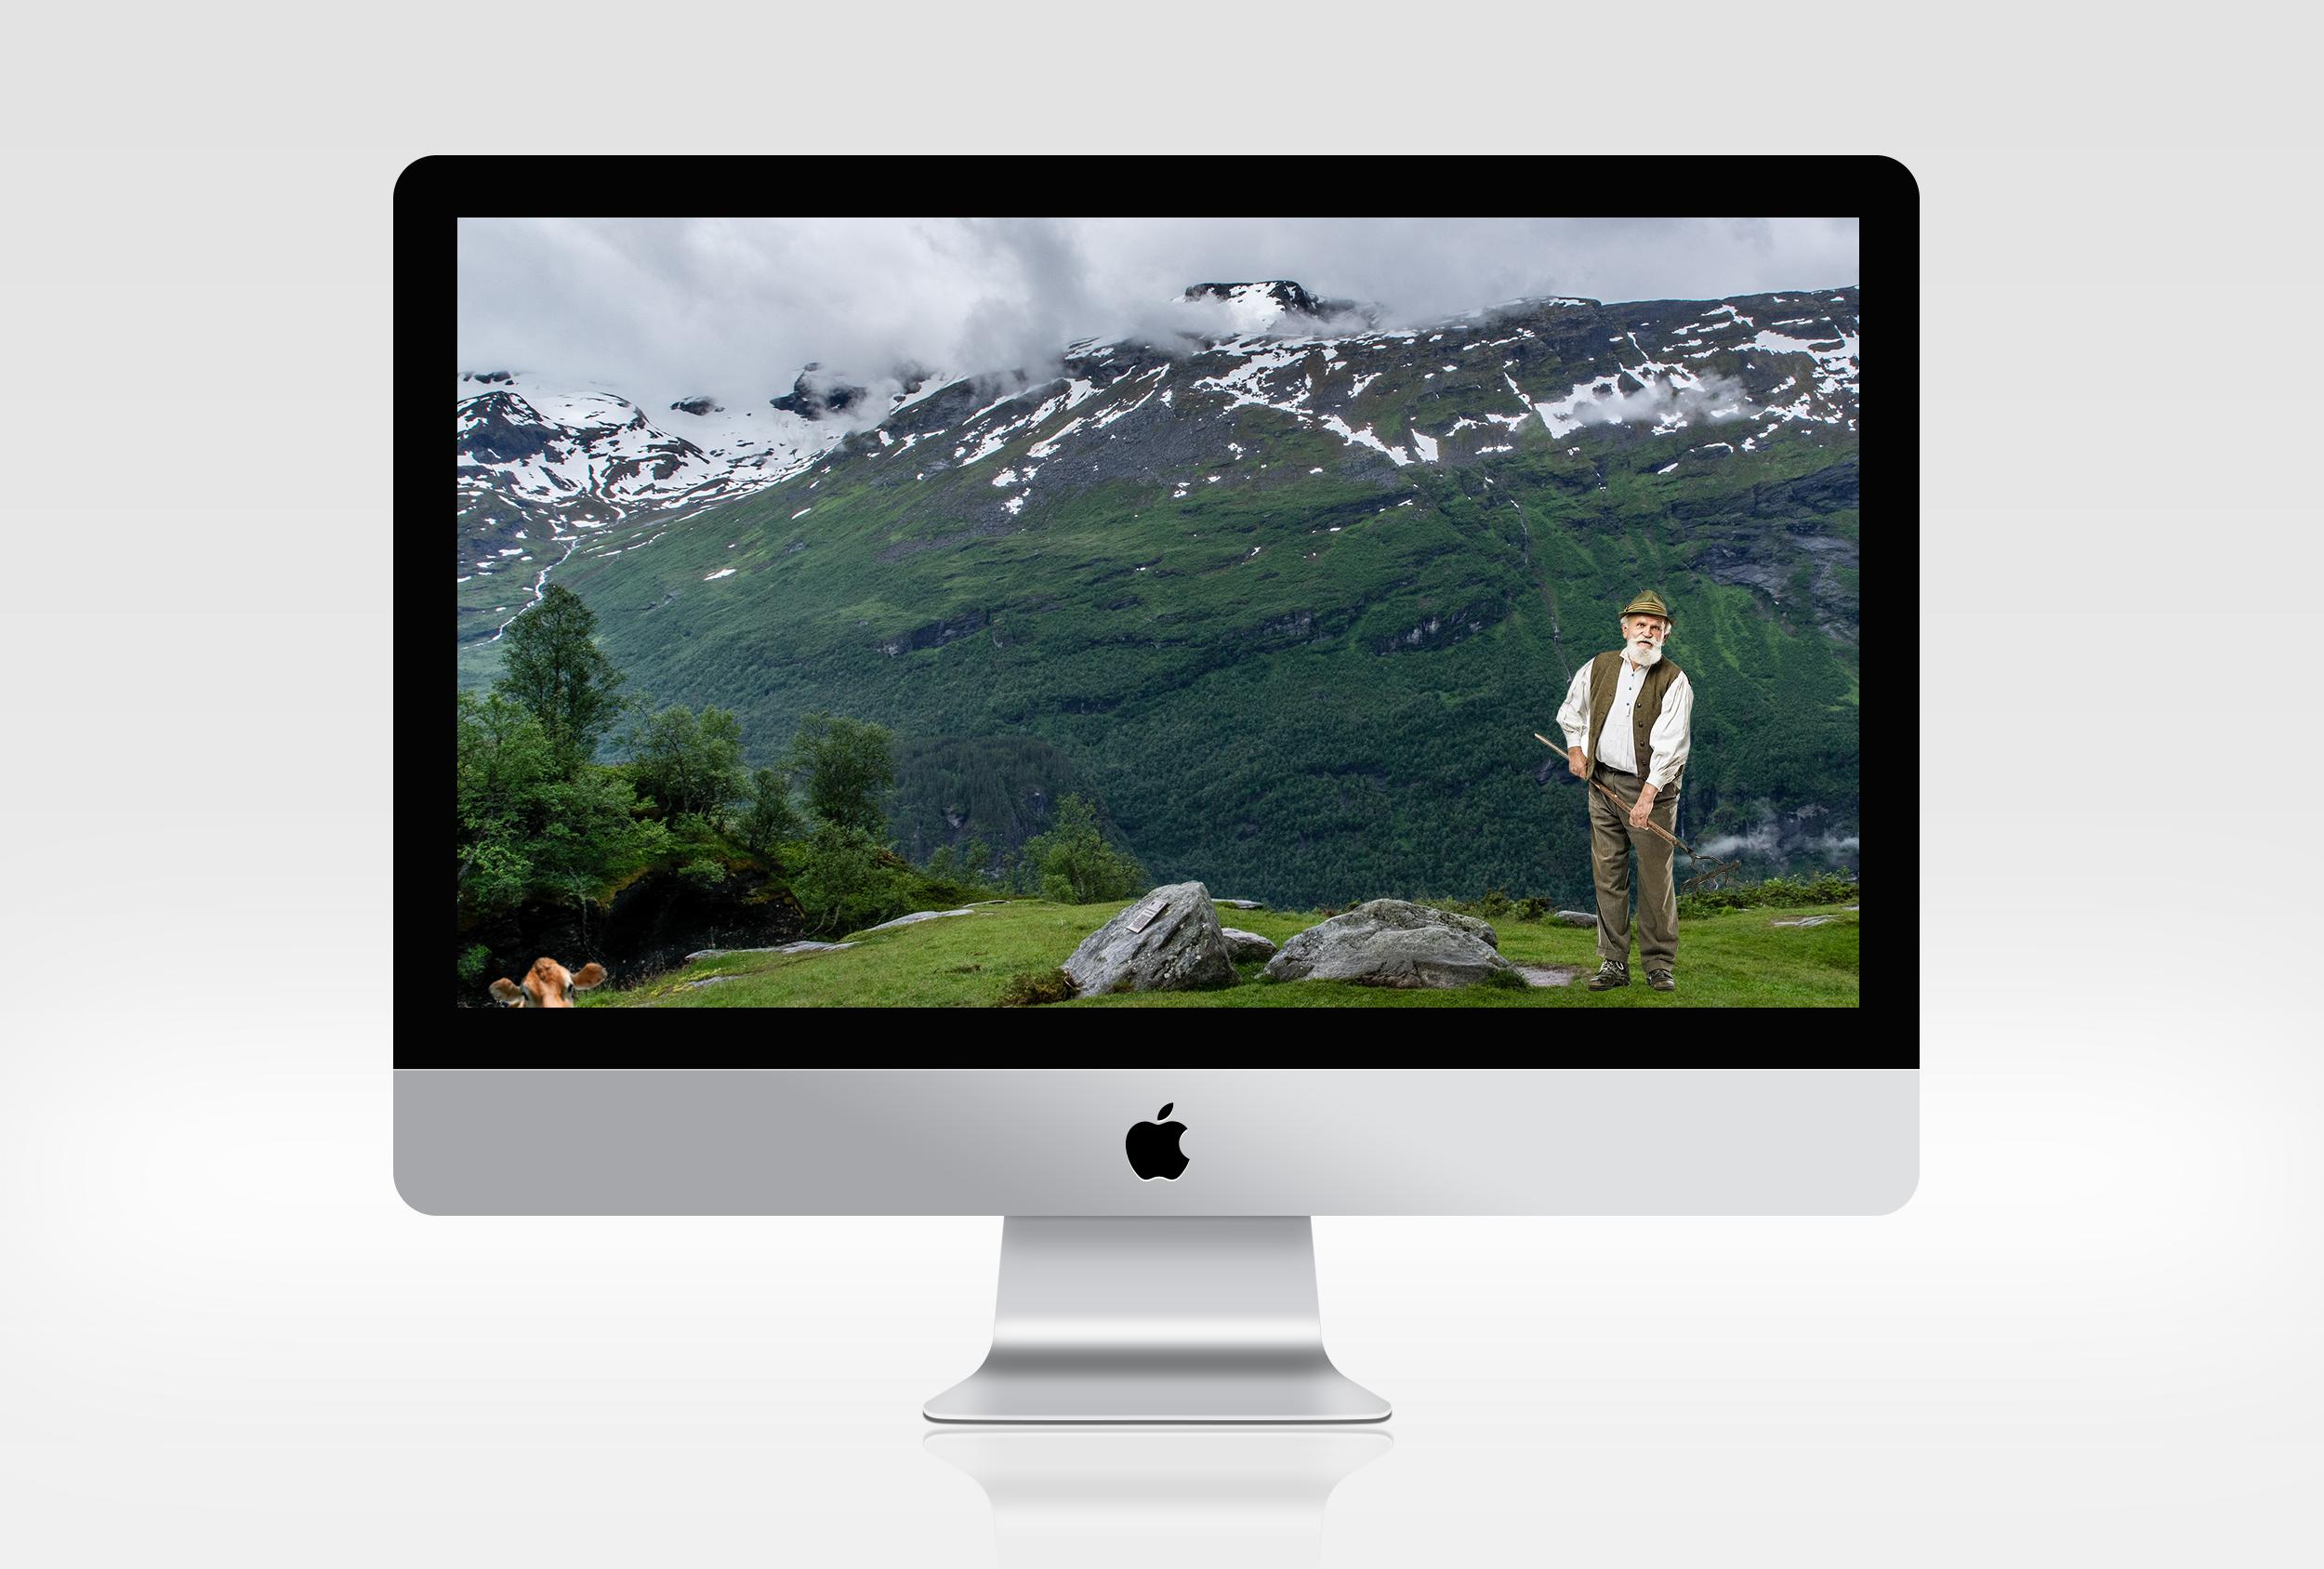 iMac-psd-mockup-template-7.png